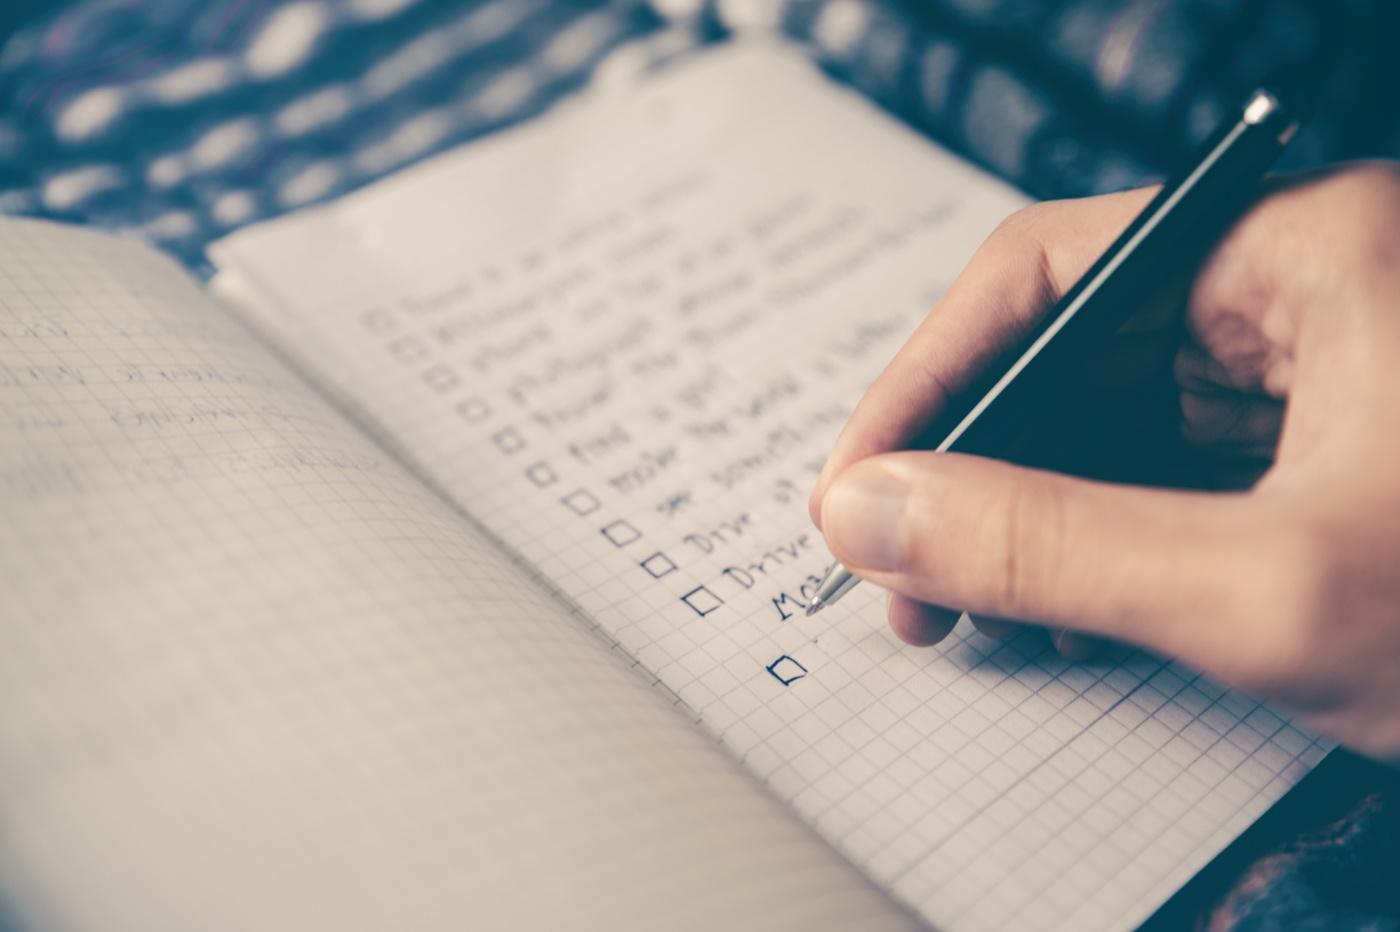 smart goals-lupus-lupuscorner-new-year-resolutions-cover